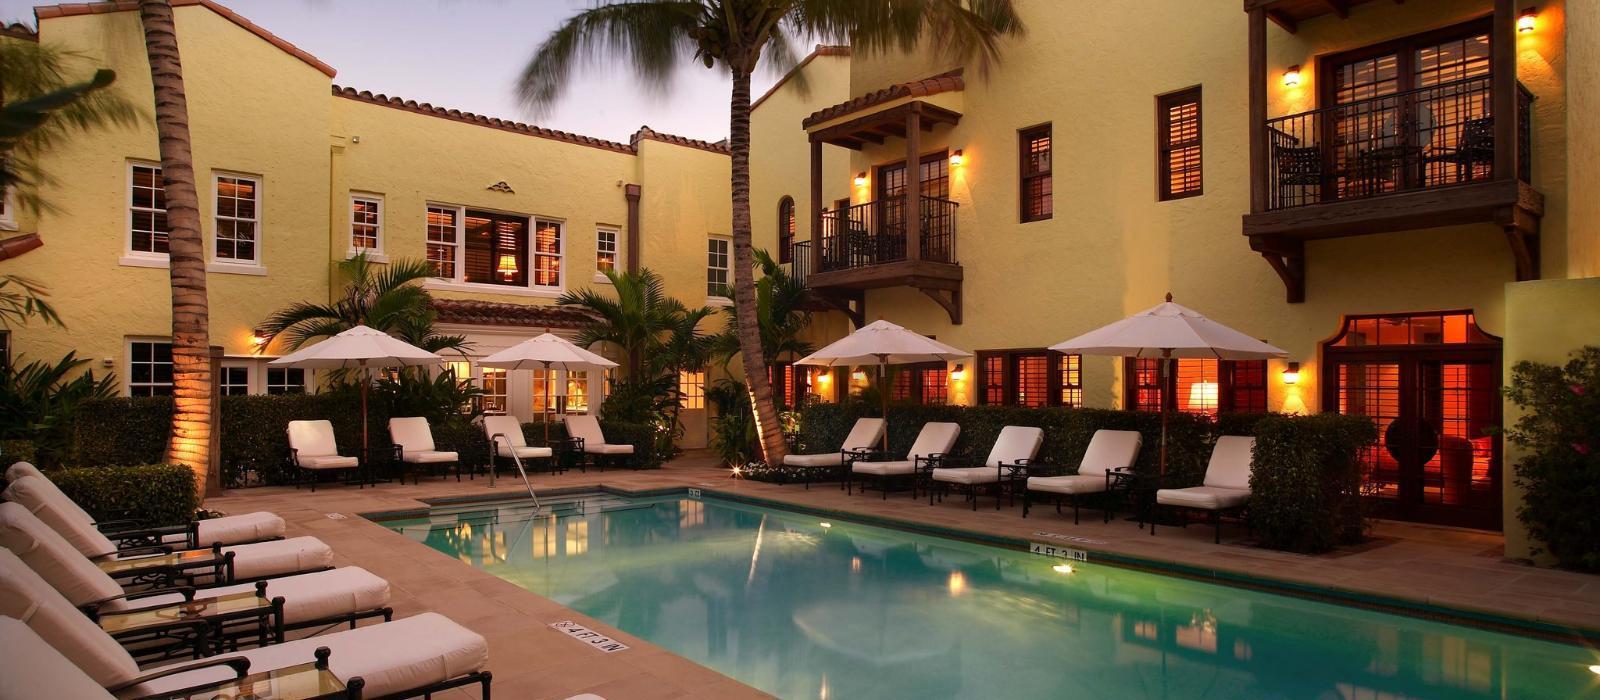 巴西苑酒店(The Brazilian Court Hotel) 图片  www.lhw.cn